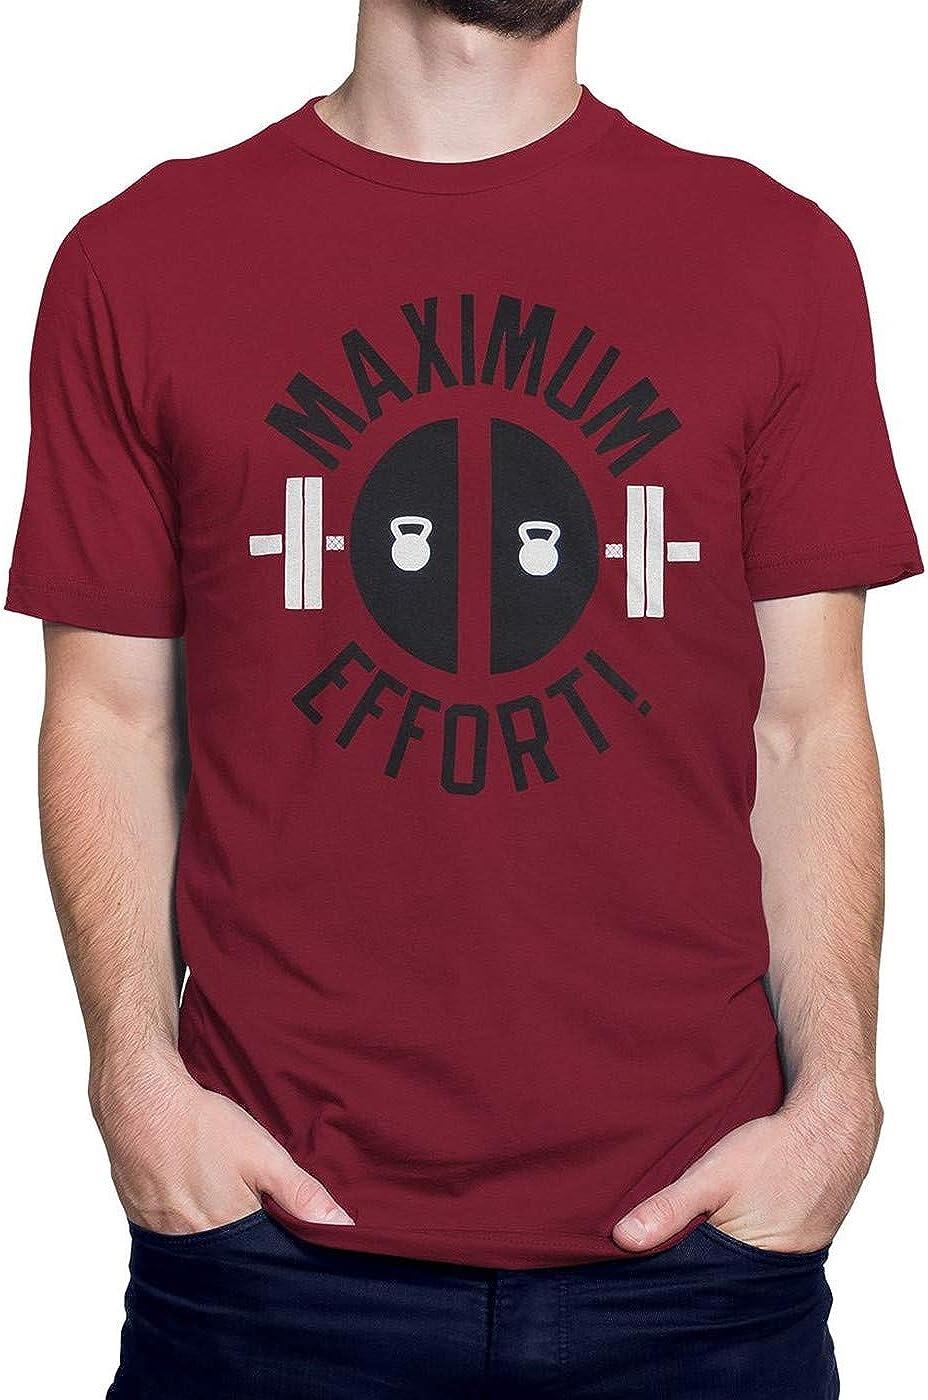 Deadpool Maximum Effort Men's Super special High material price T-Shirt